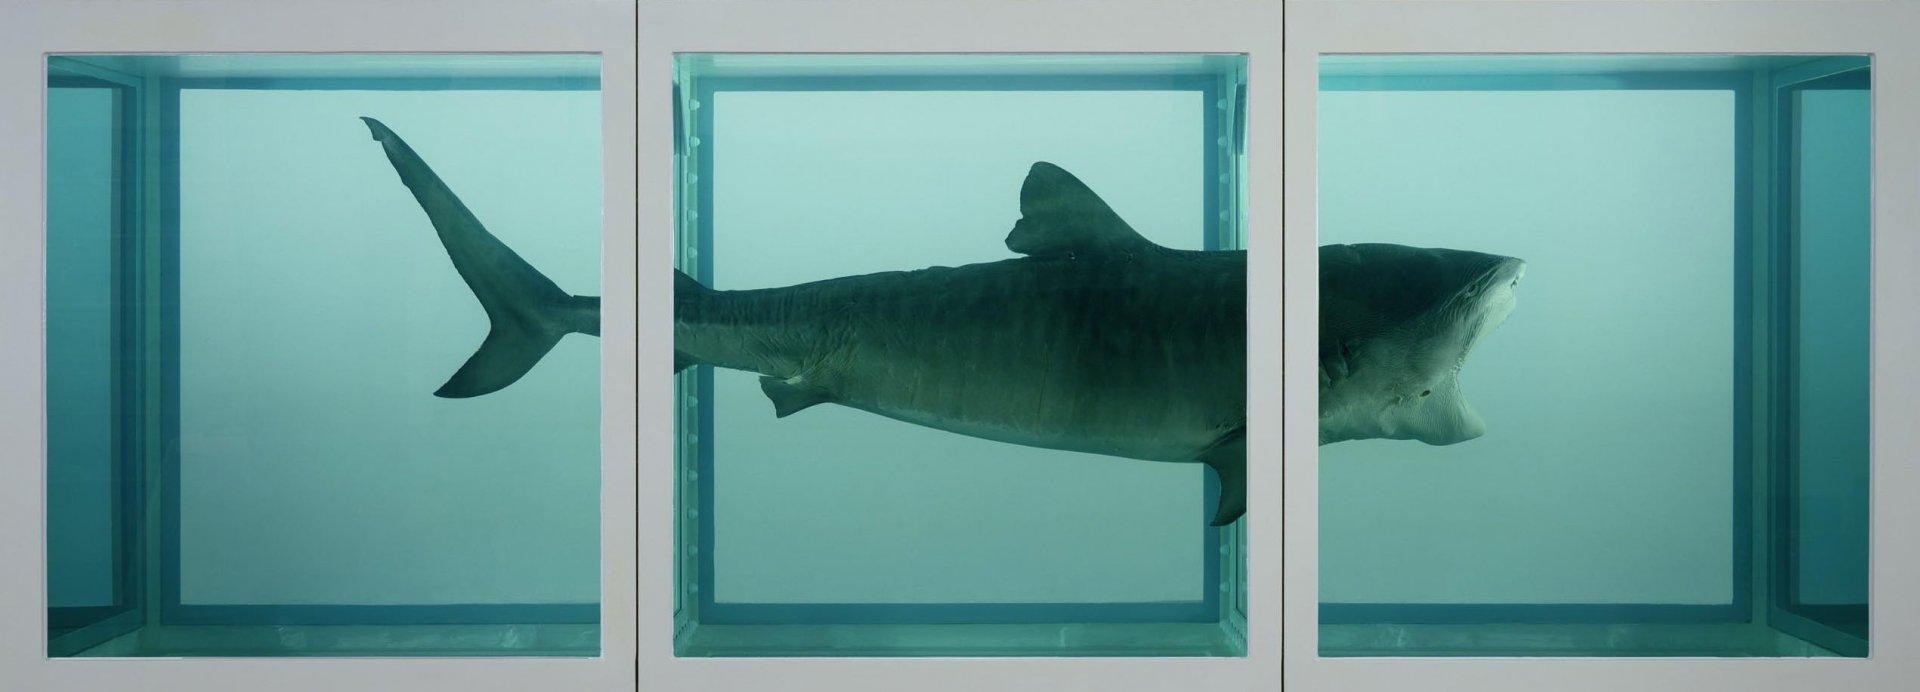 damien-hirst-shark.jpg